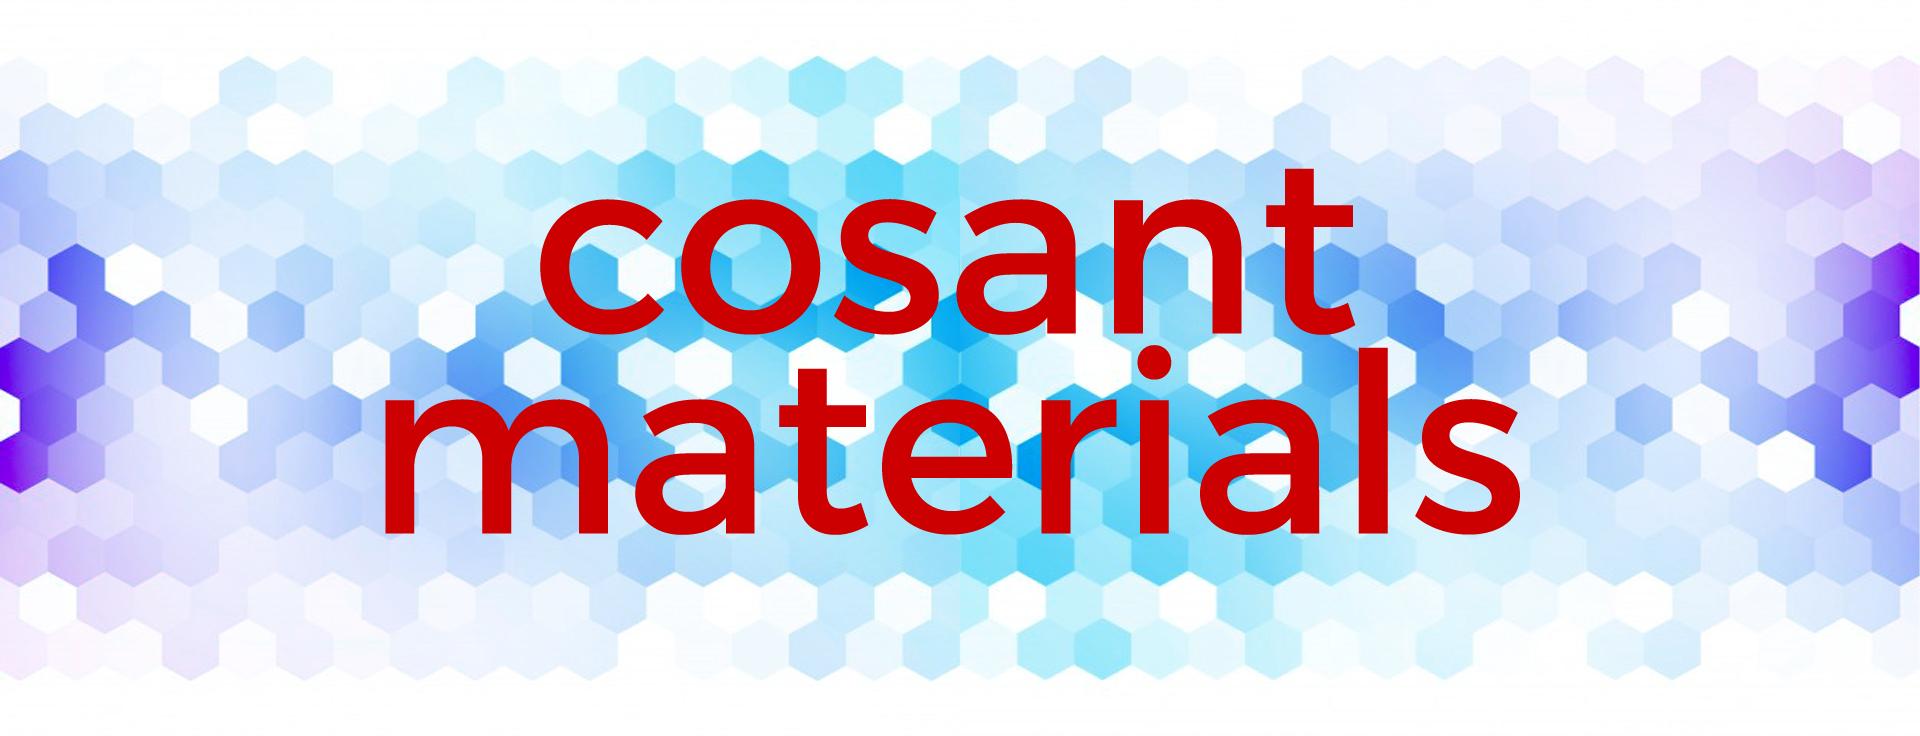 cosant materials banner.jpg